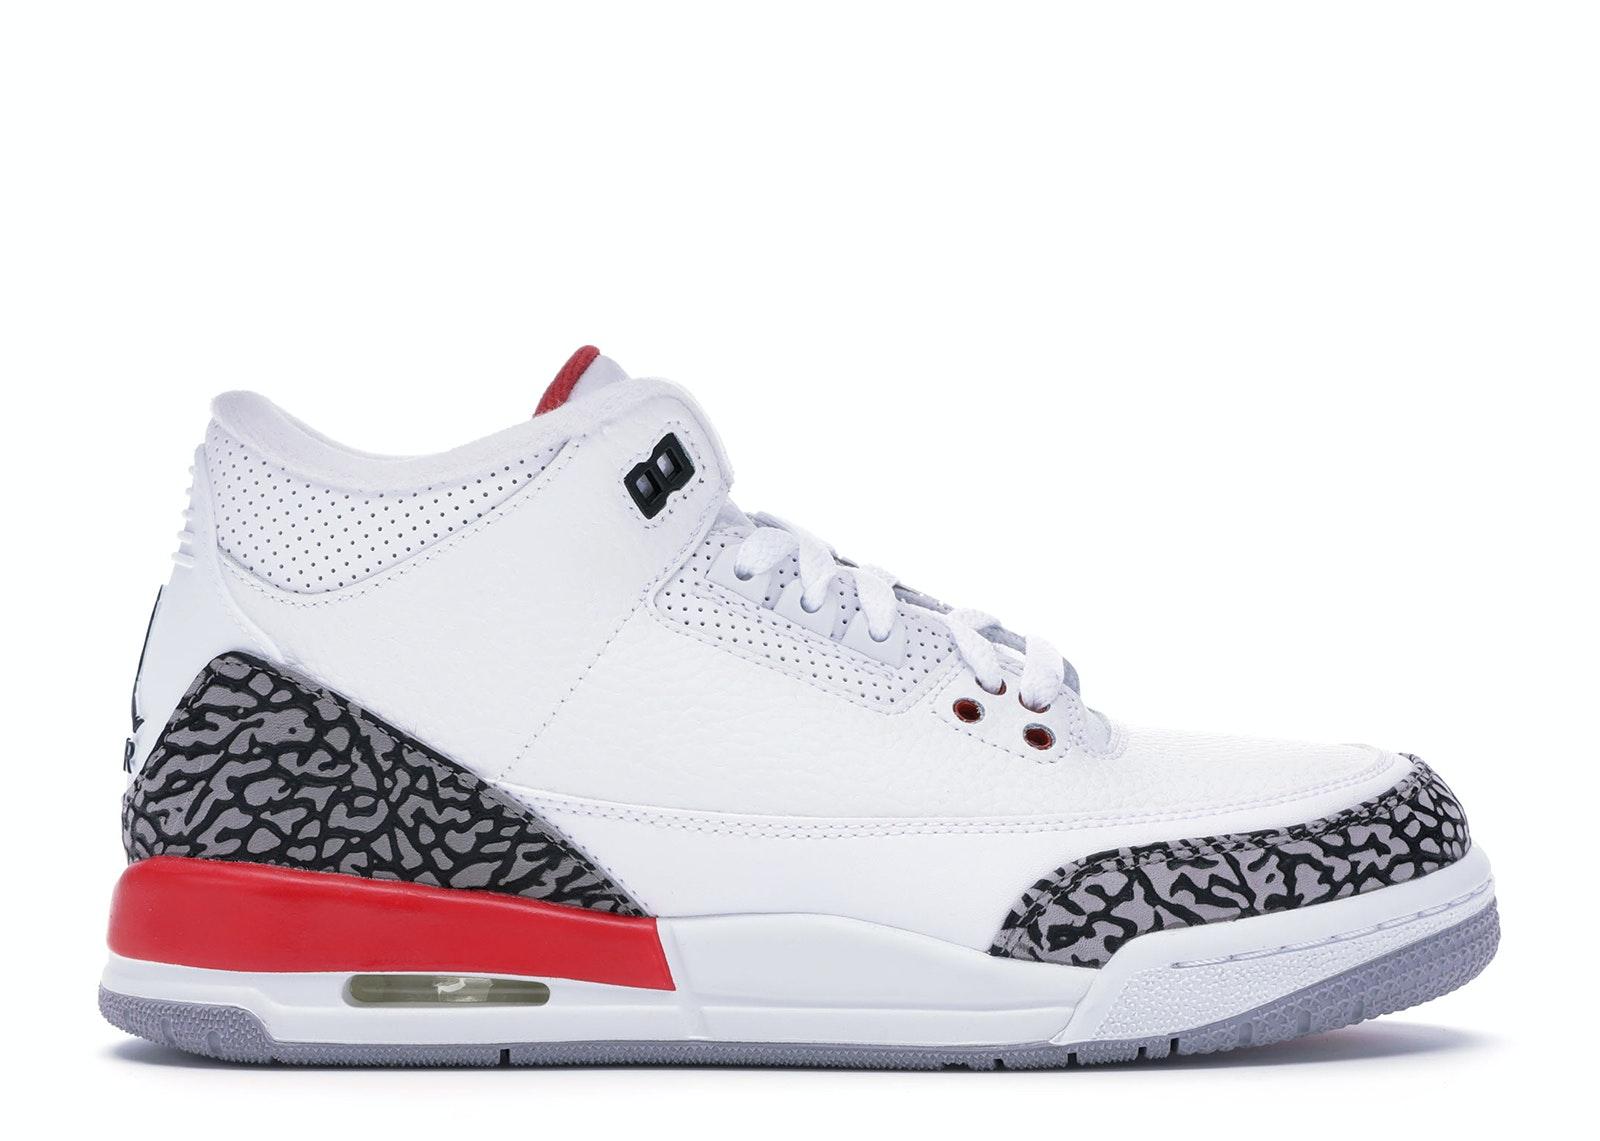 Jordan 3 Retro Hall of Fame (GS)